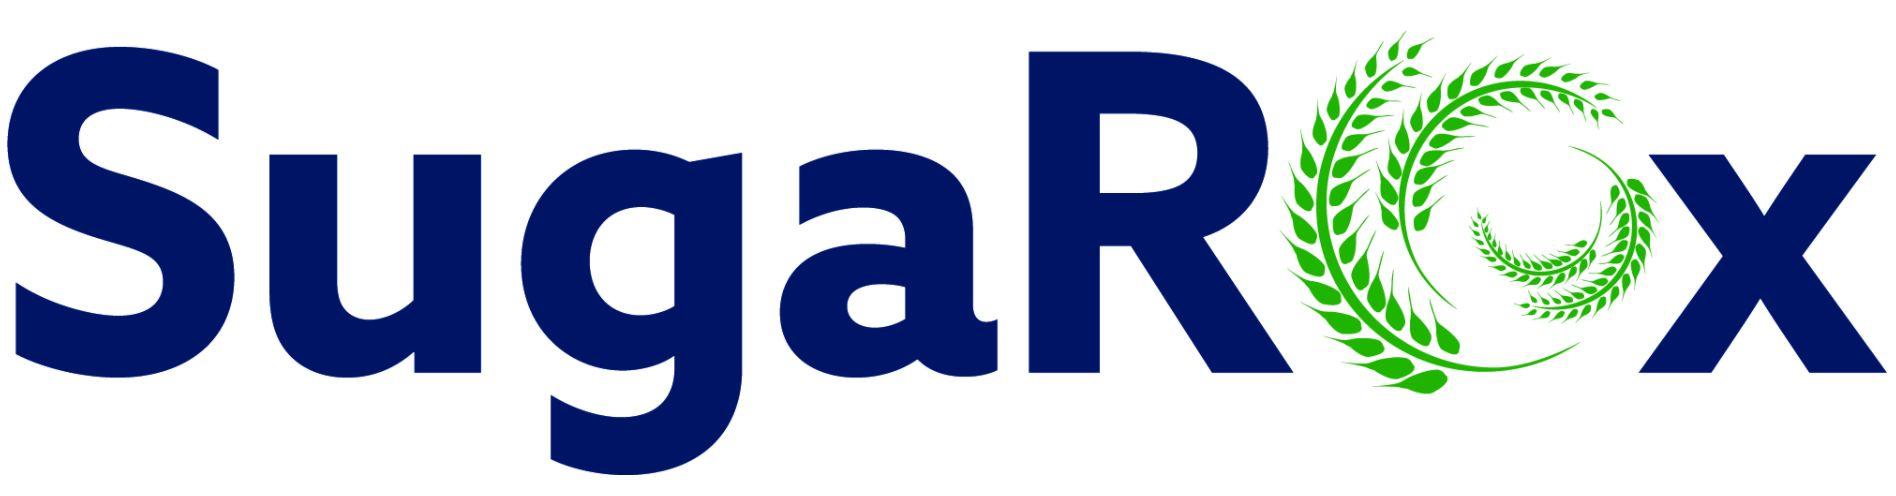 SugarOx logo